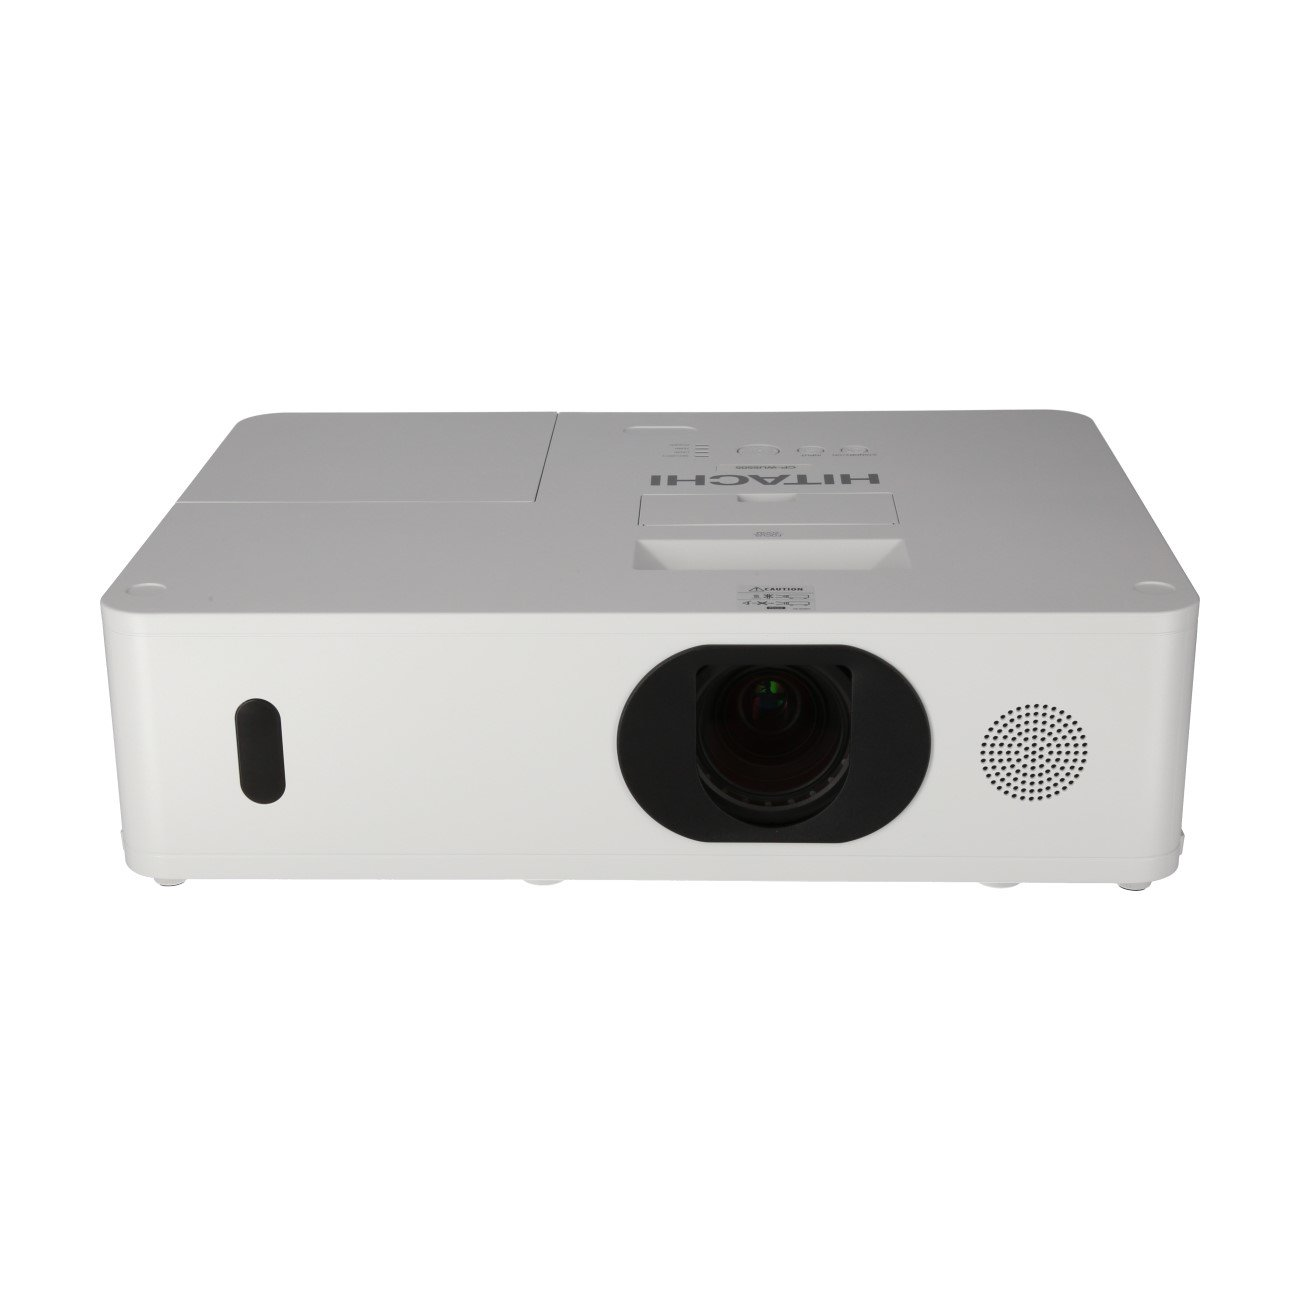 Projectors CPWU5505 WUXGA 5200 Lumens Projector